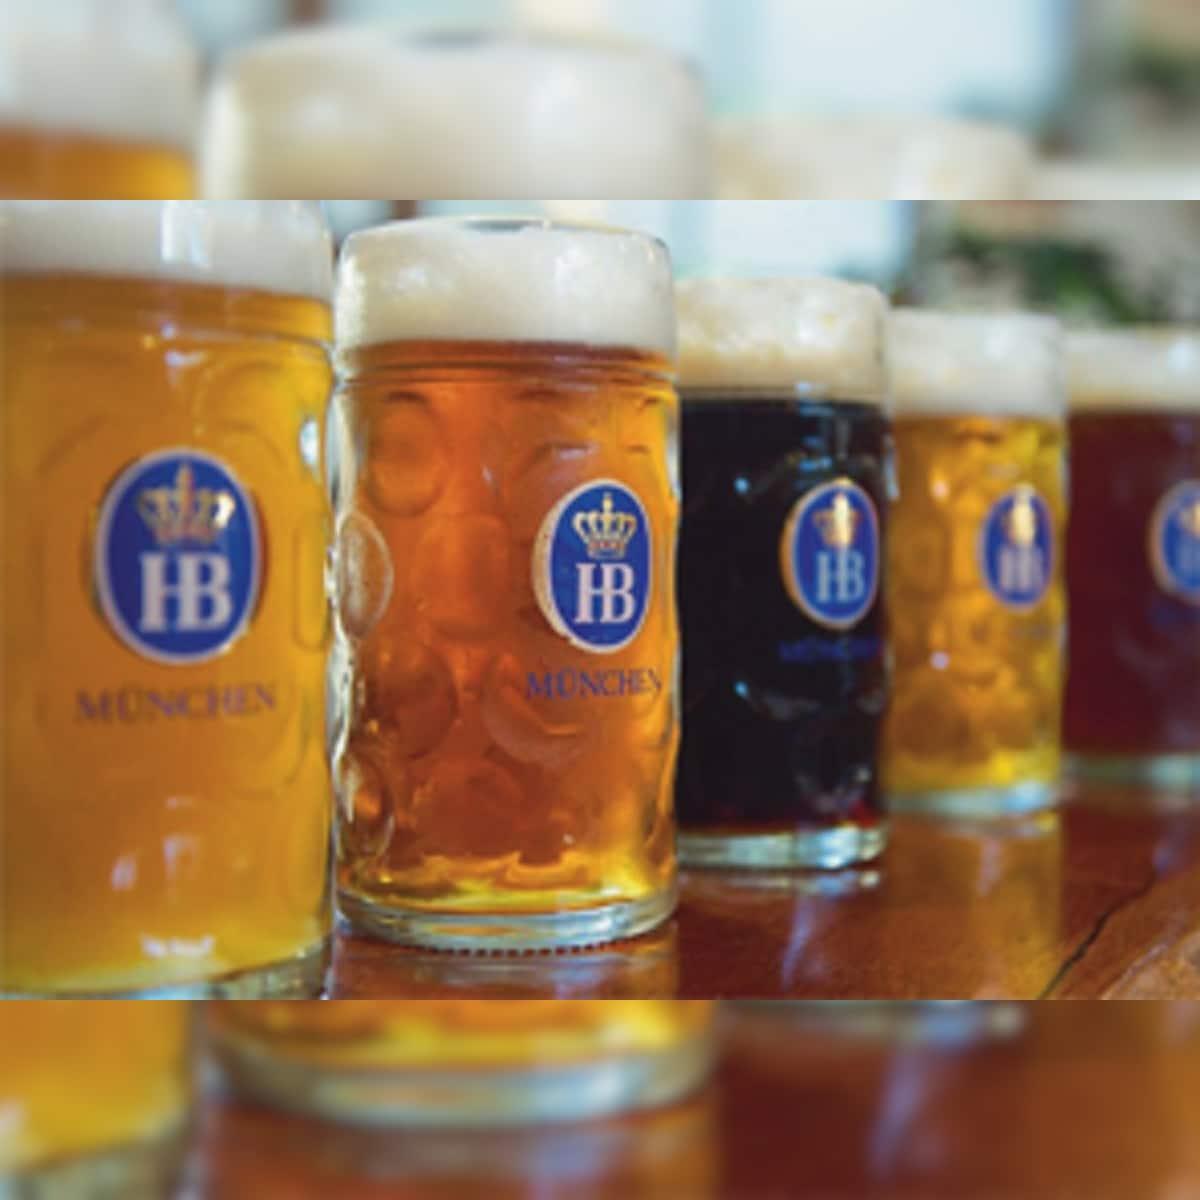 Bier hitler Adolf Hitler's